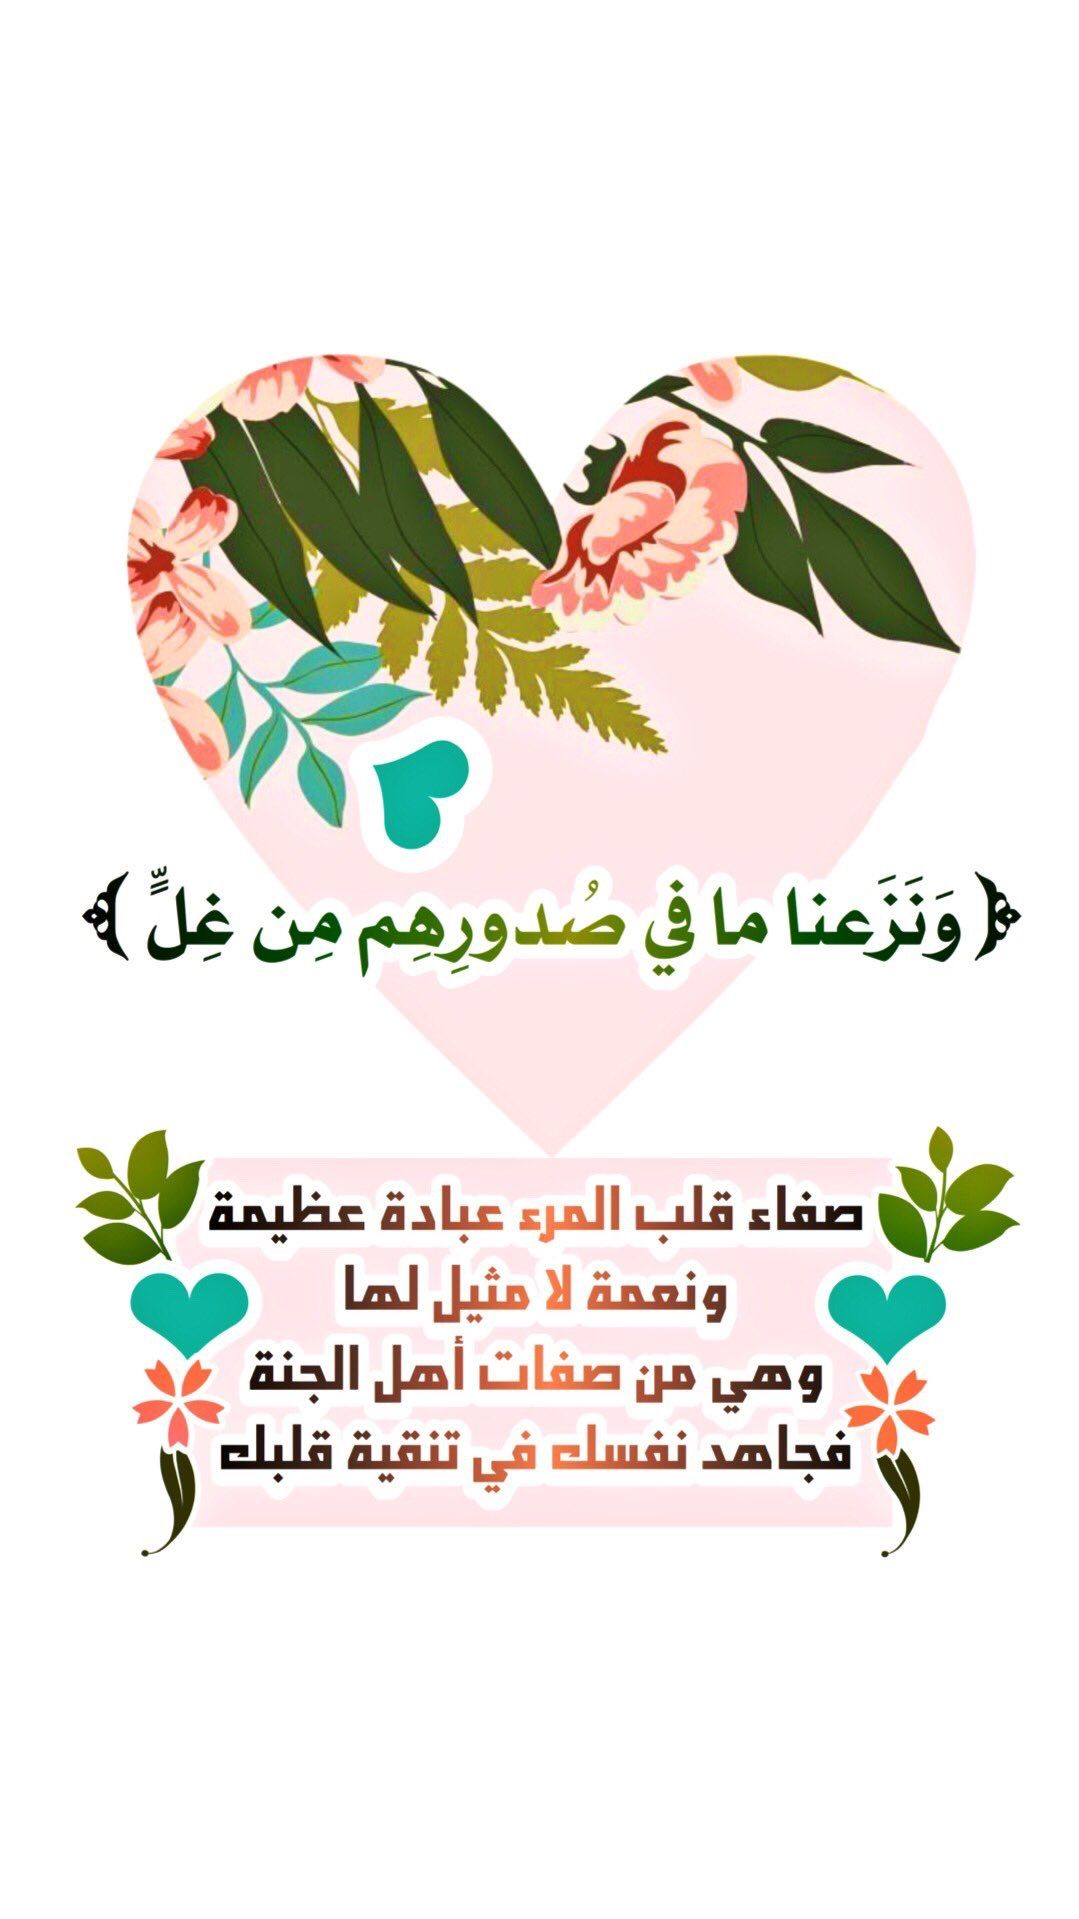 Pin By الأثر الجميل On تدبرات Quran Quotes Verses Quran Verses Islamic Quotes Quran